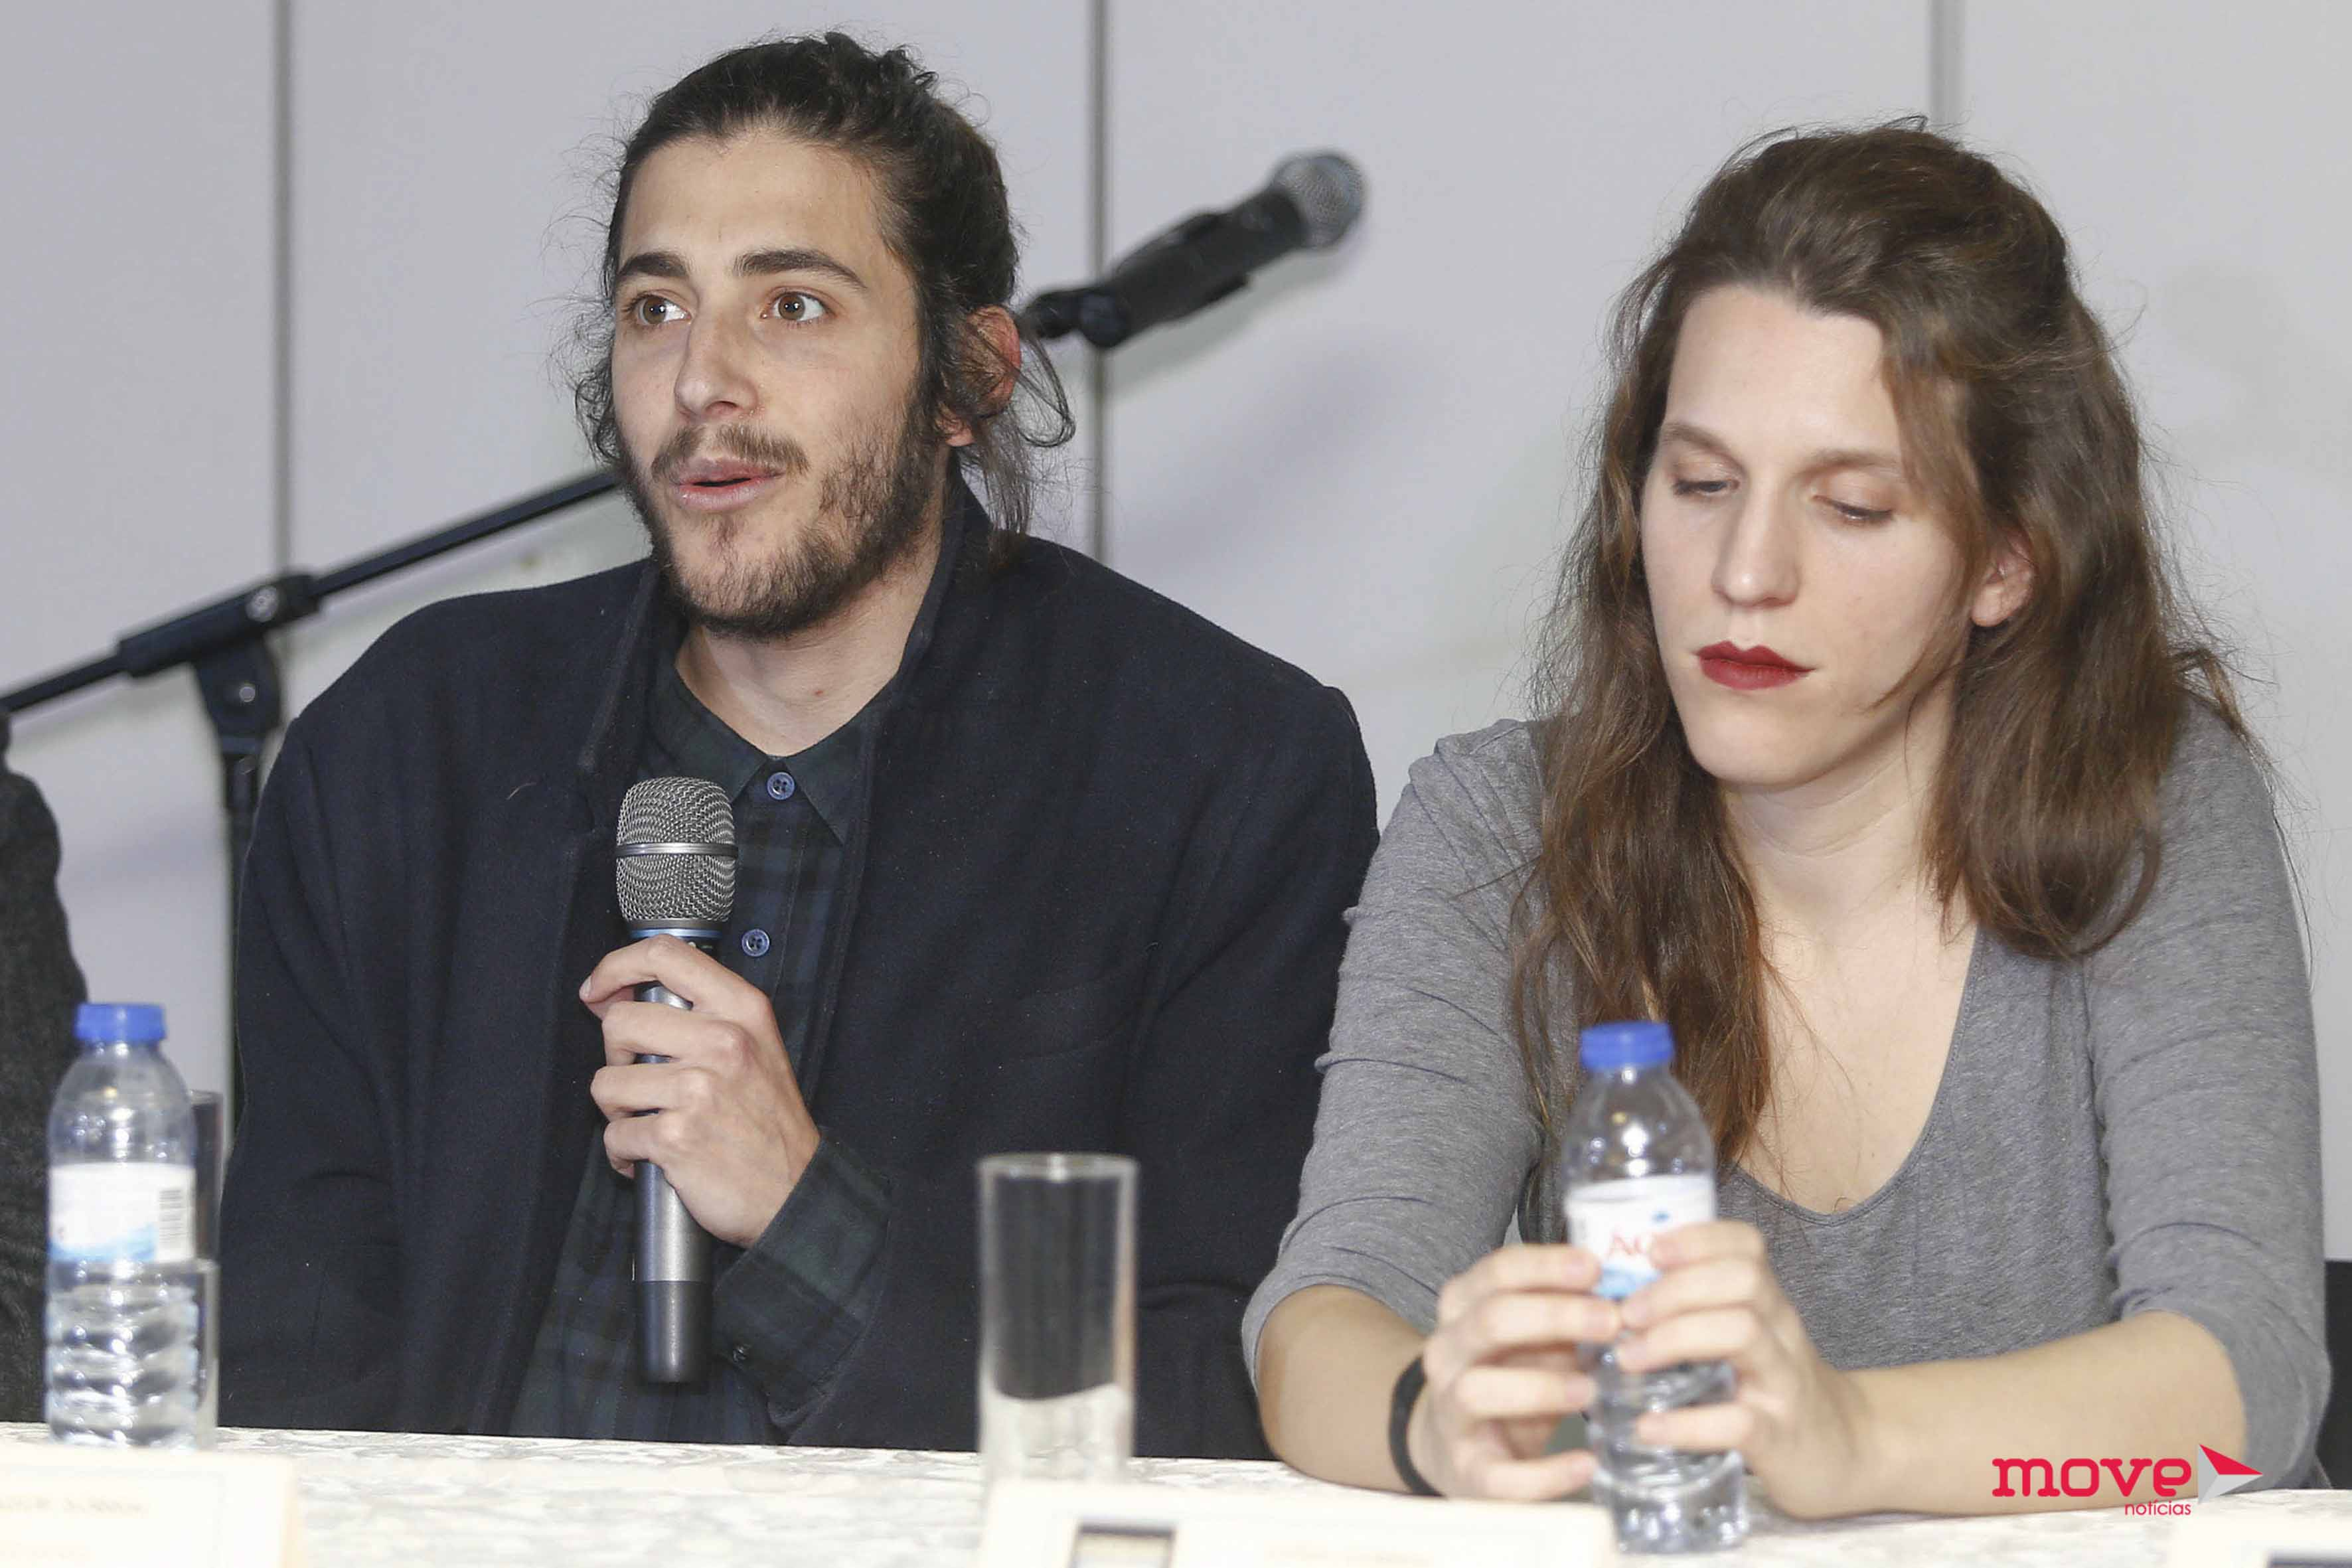 RTP confirma problemas de saúde de Salvador Sobral